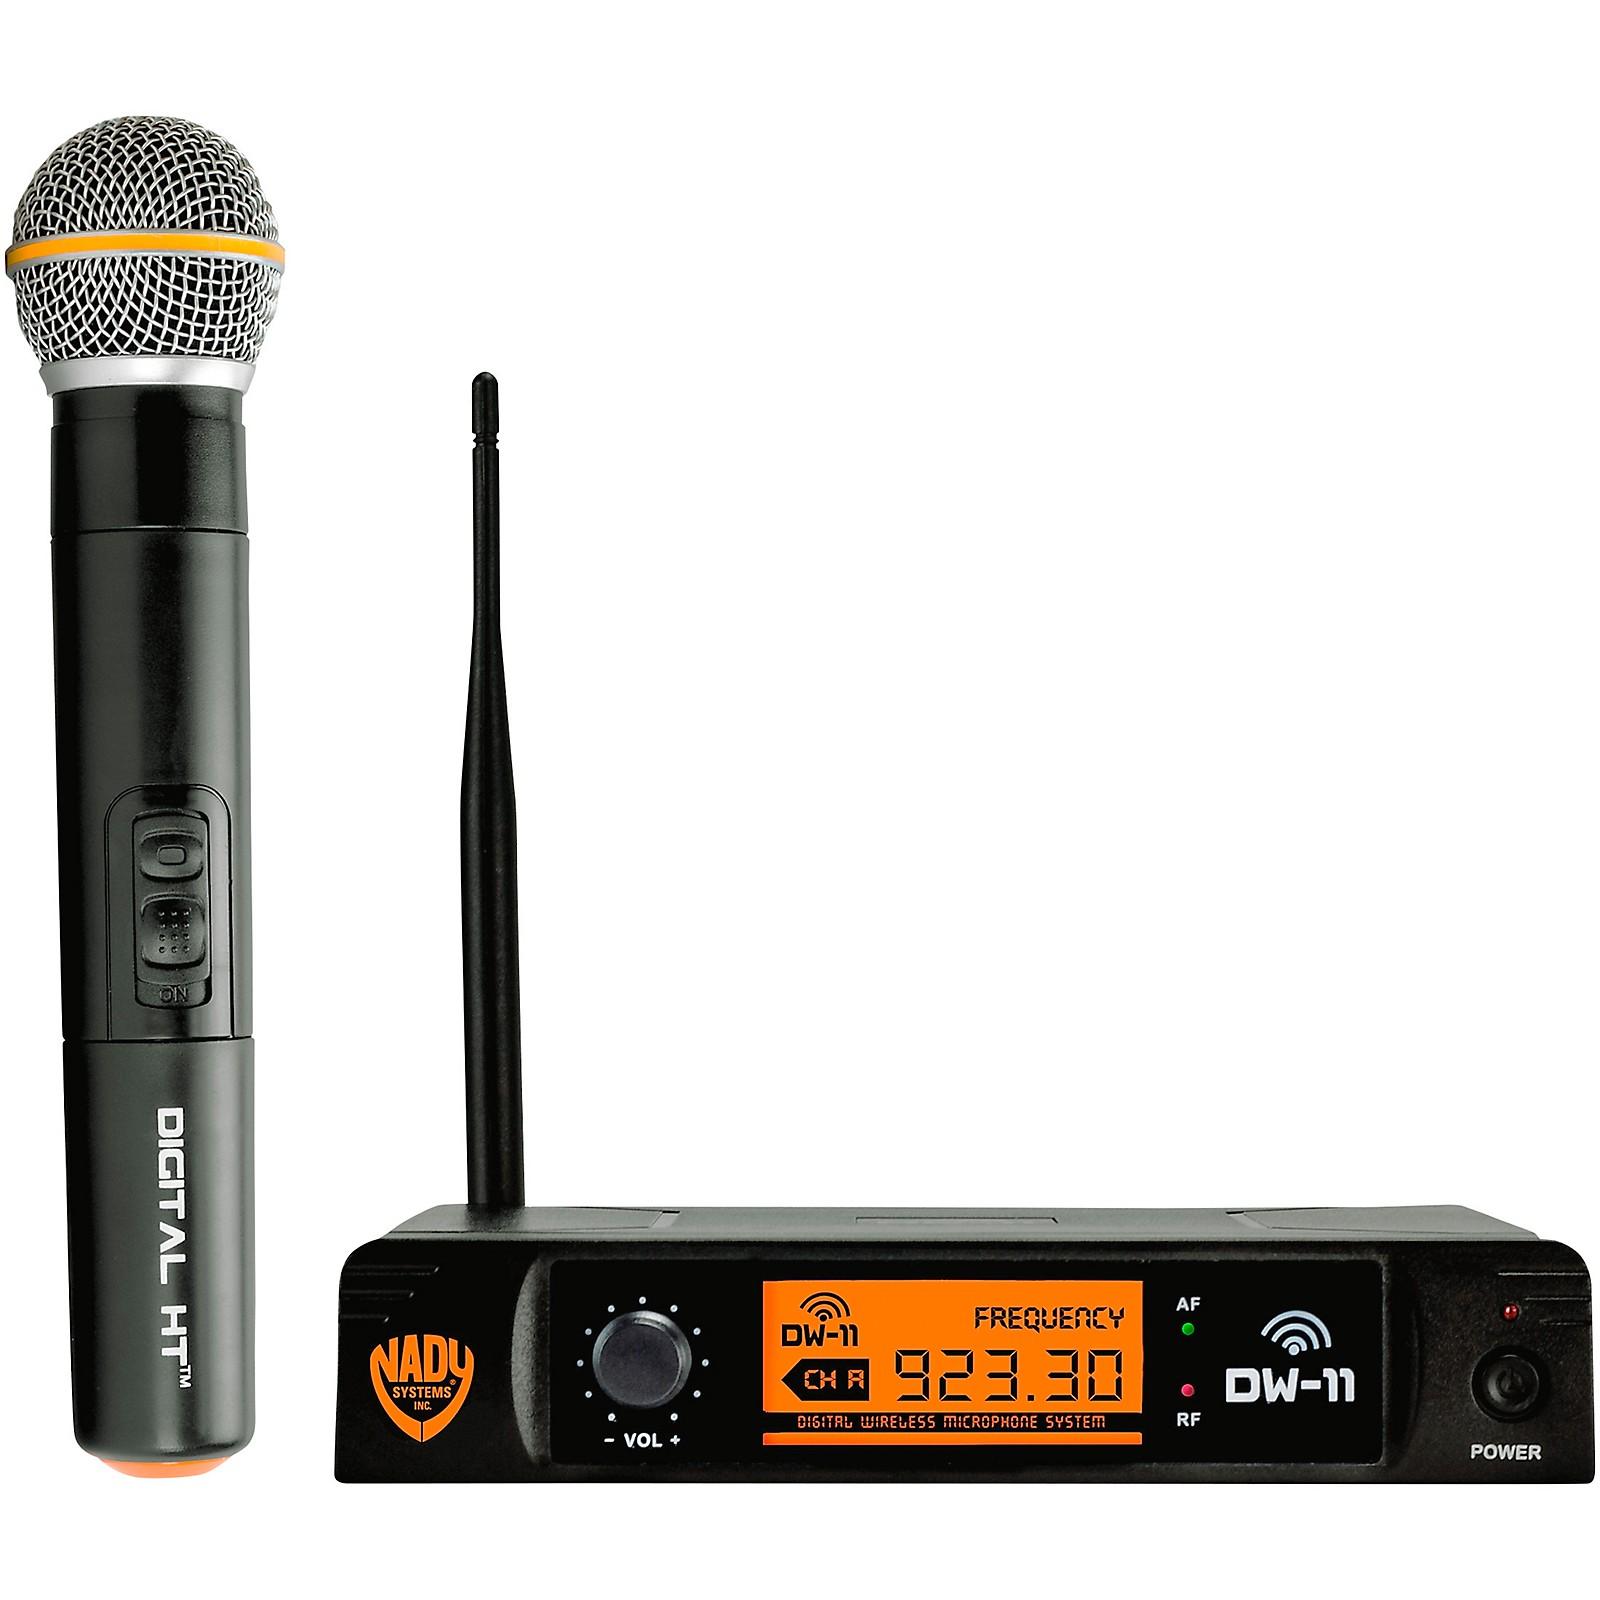 Nady DW-11 HT 24 bit Digital Handheld Wireless Microphone System